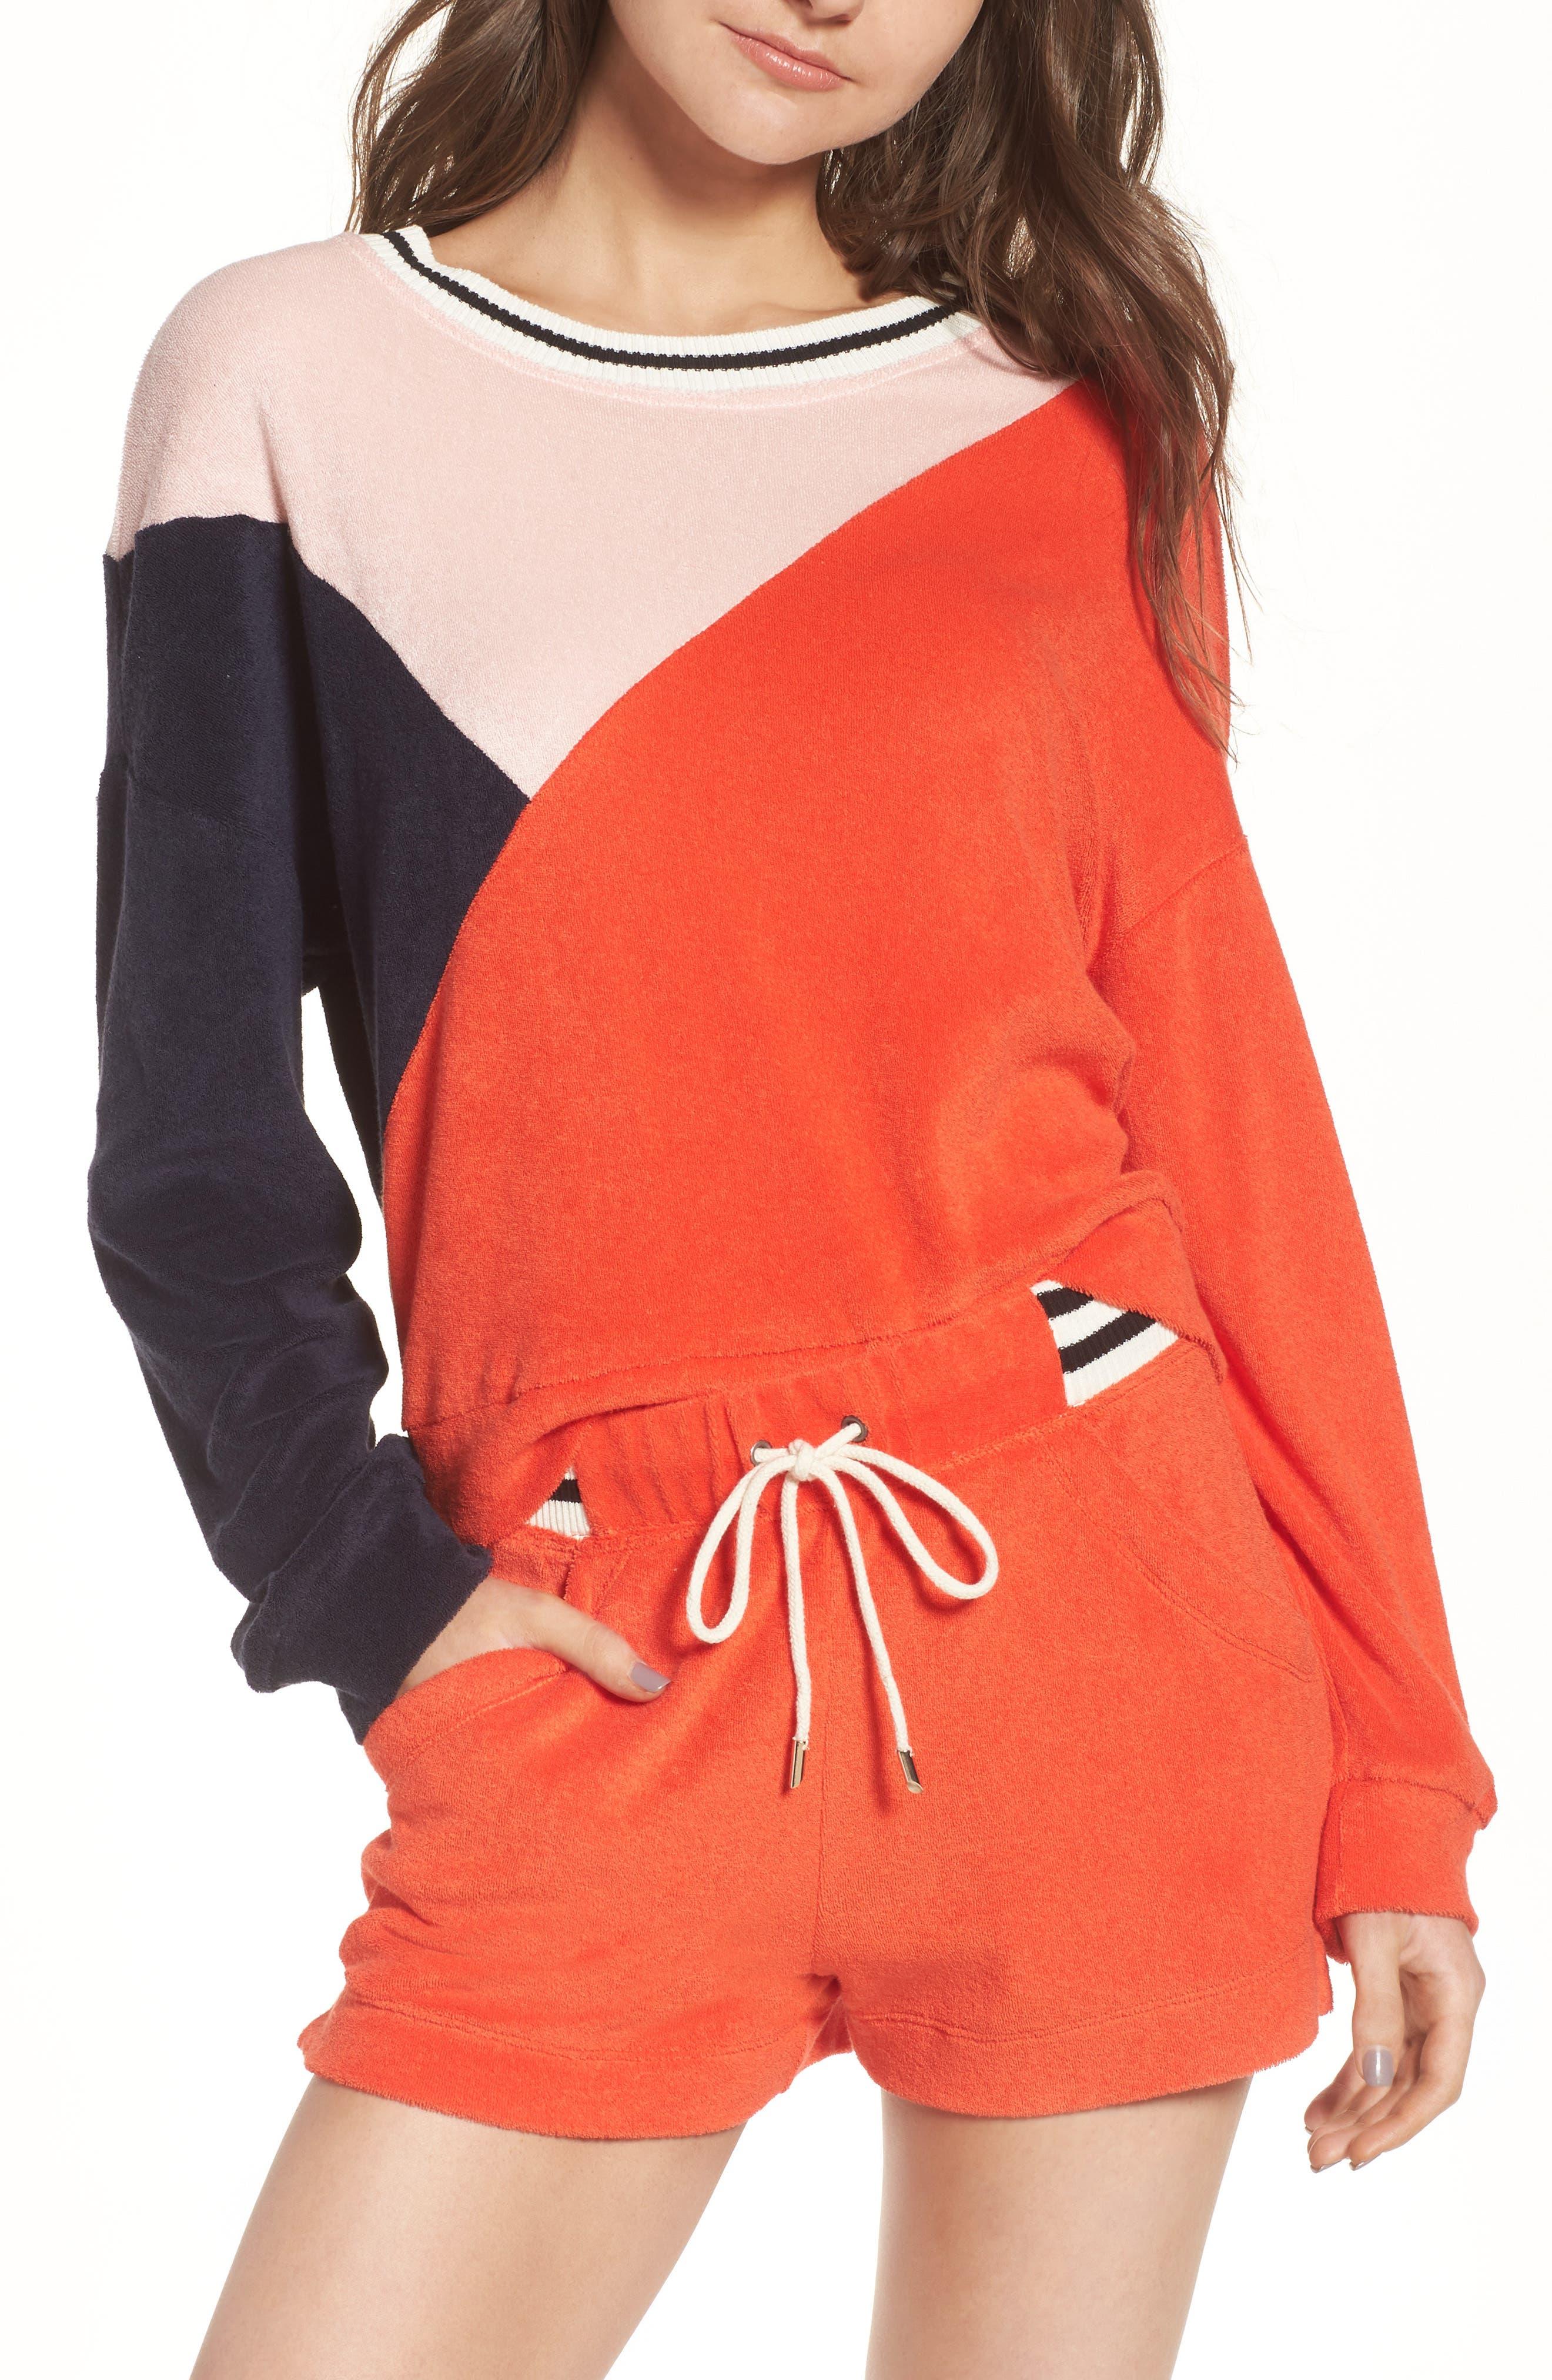 Splendid x Margherita Sportivo French Terry Sweatshirt